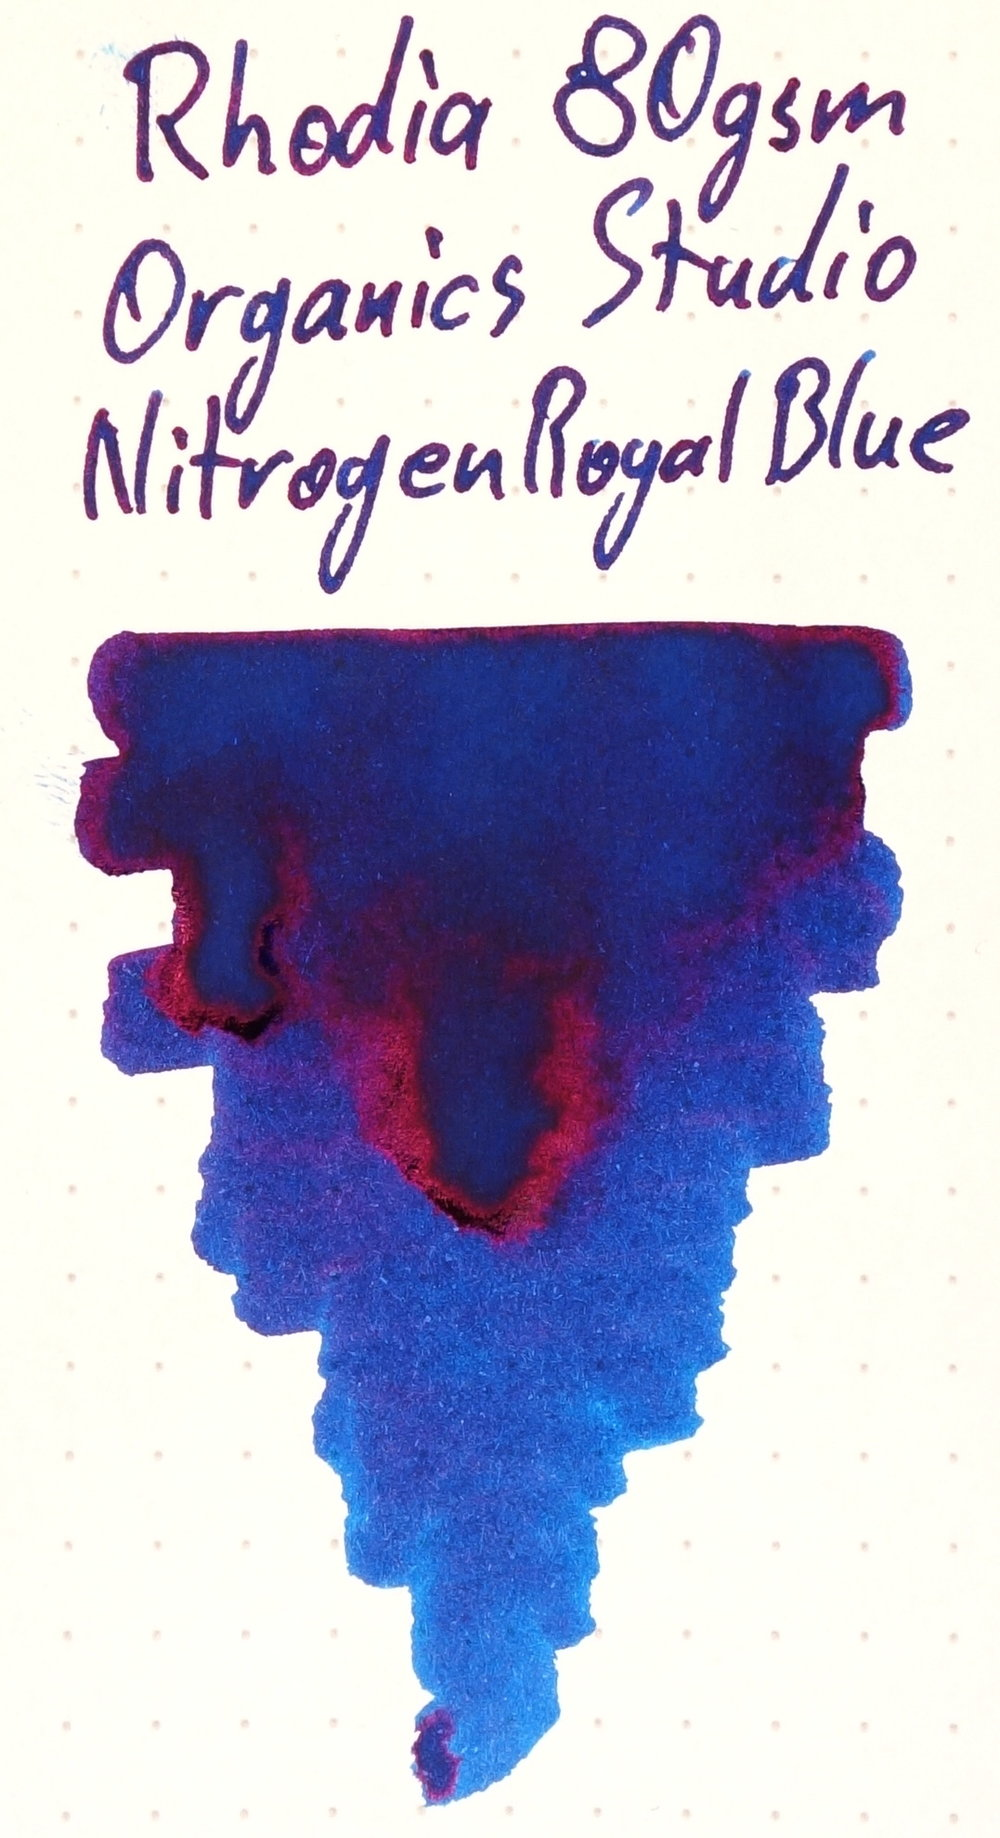 Organics Studio Nitrogen Royal Blue Rhodia.JPG